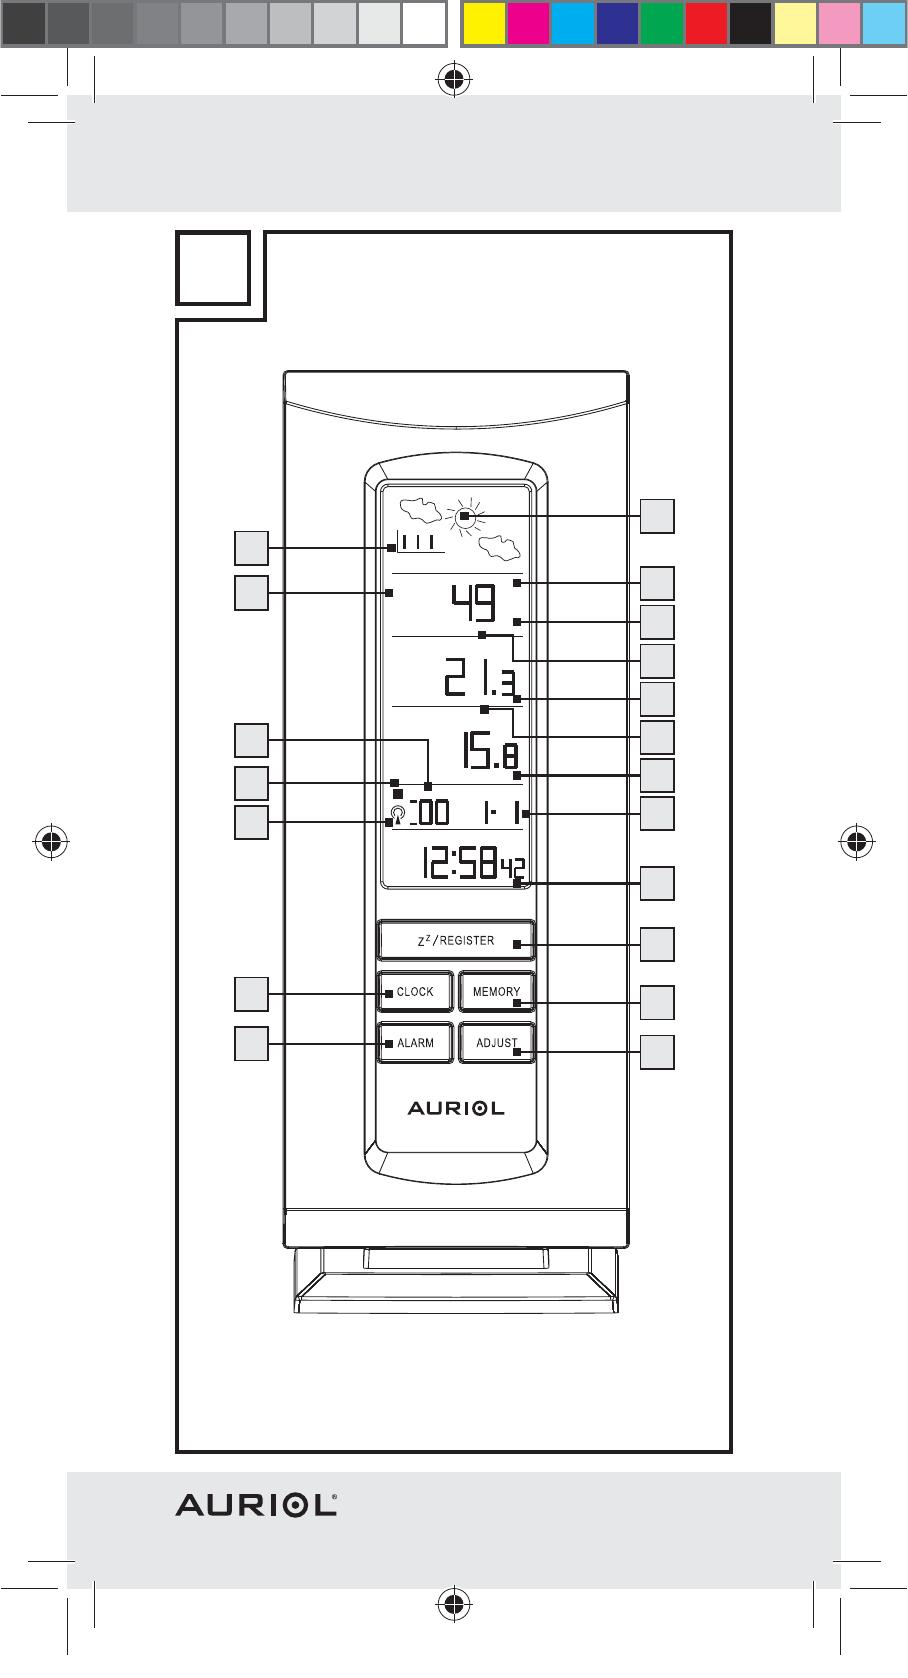 Manual Auriol Z29962a Ian 64089 Page 1 Of 94 German French